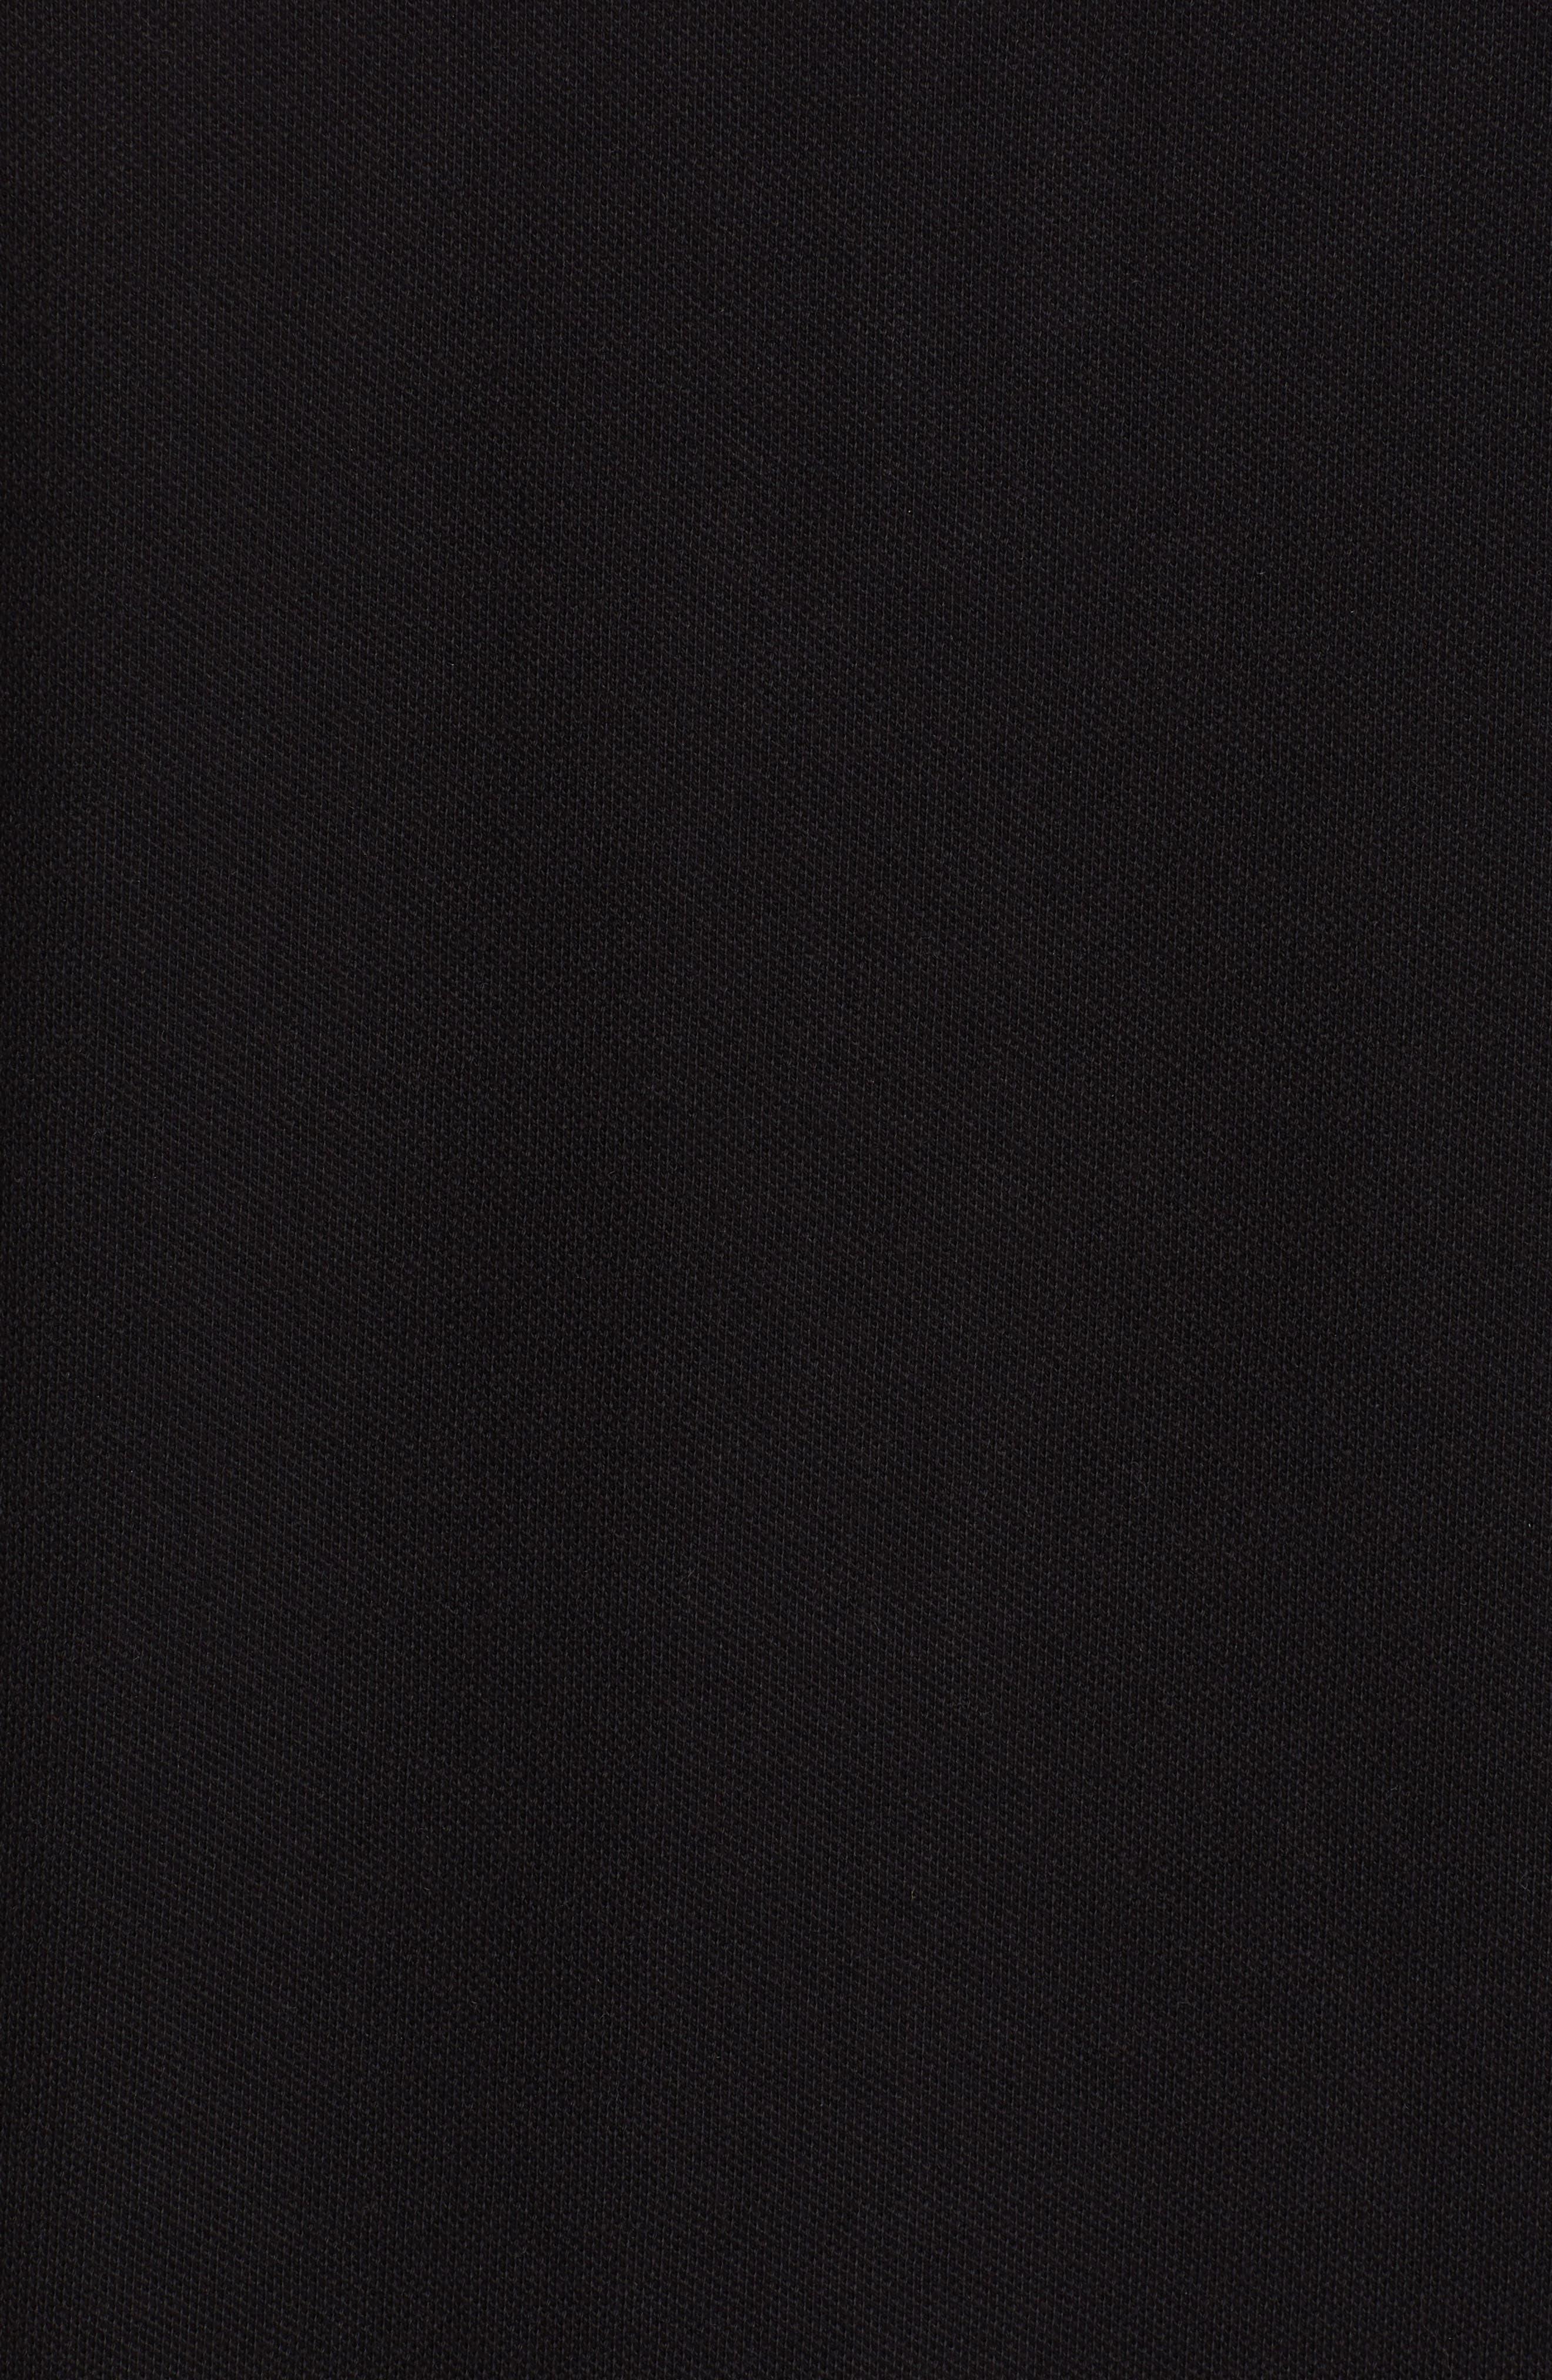 VERSACE COLLECTION, Geometric Pique Polo, Alternate thumbnail 5, color, 001